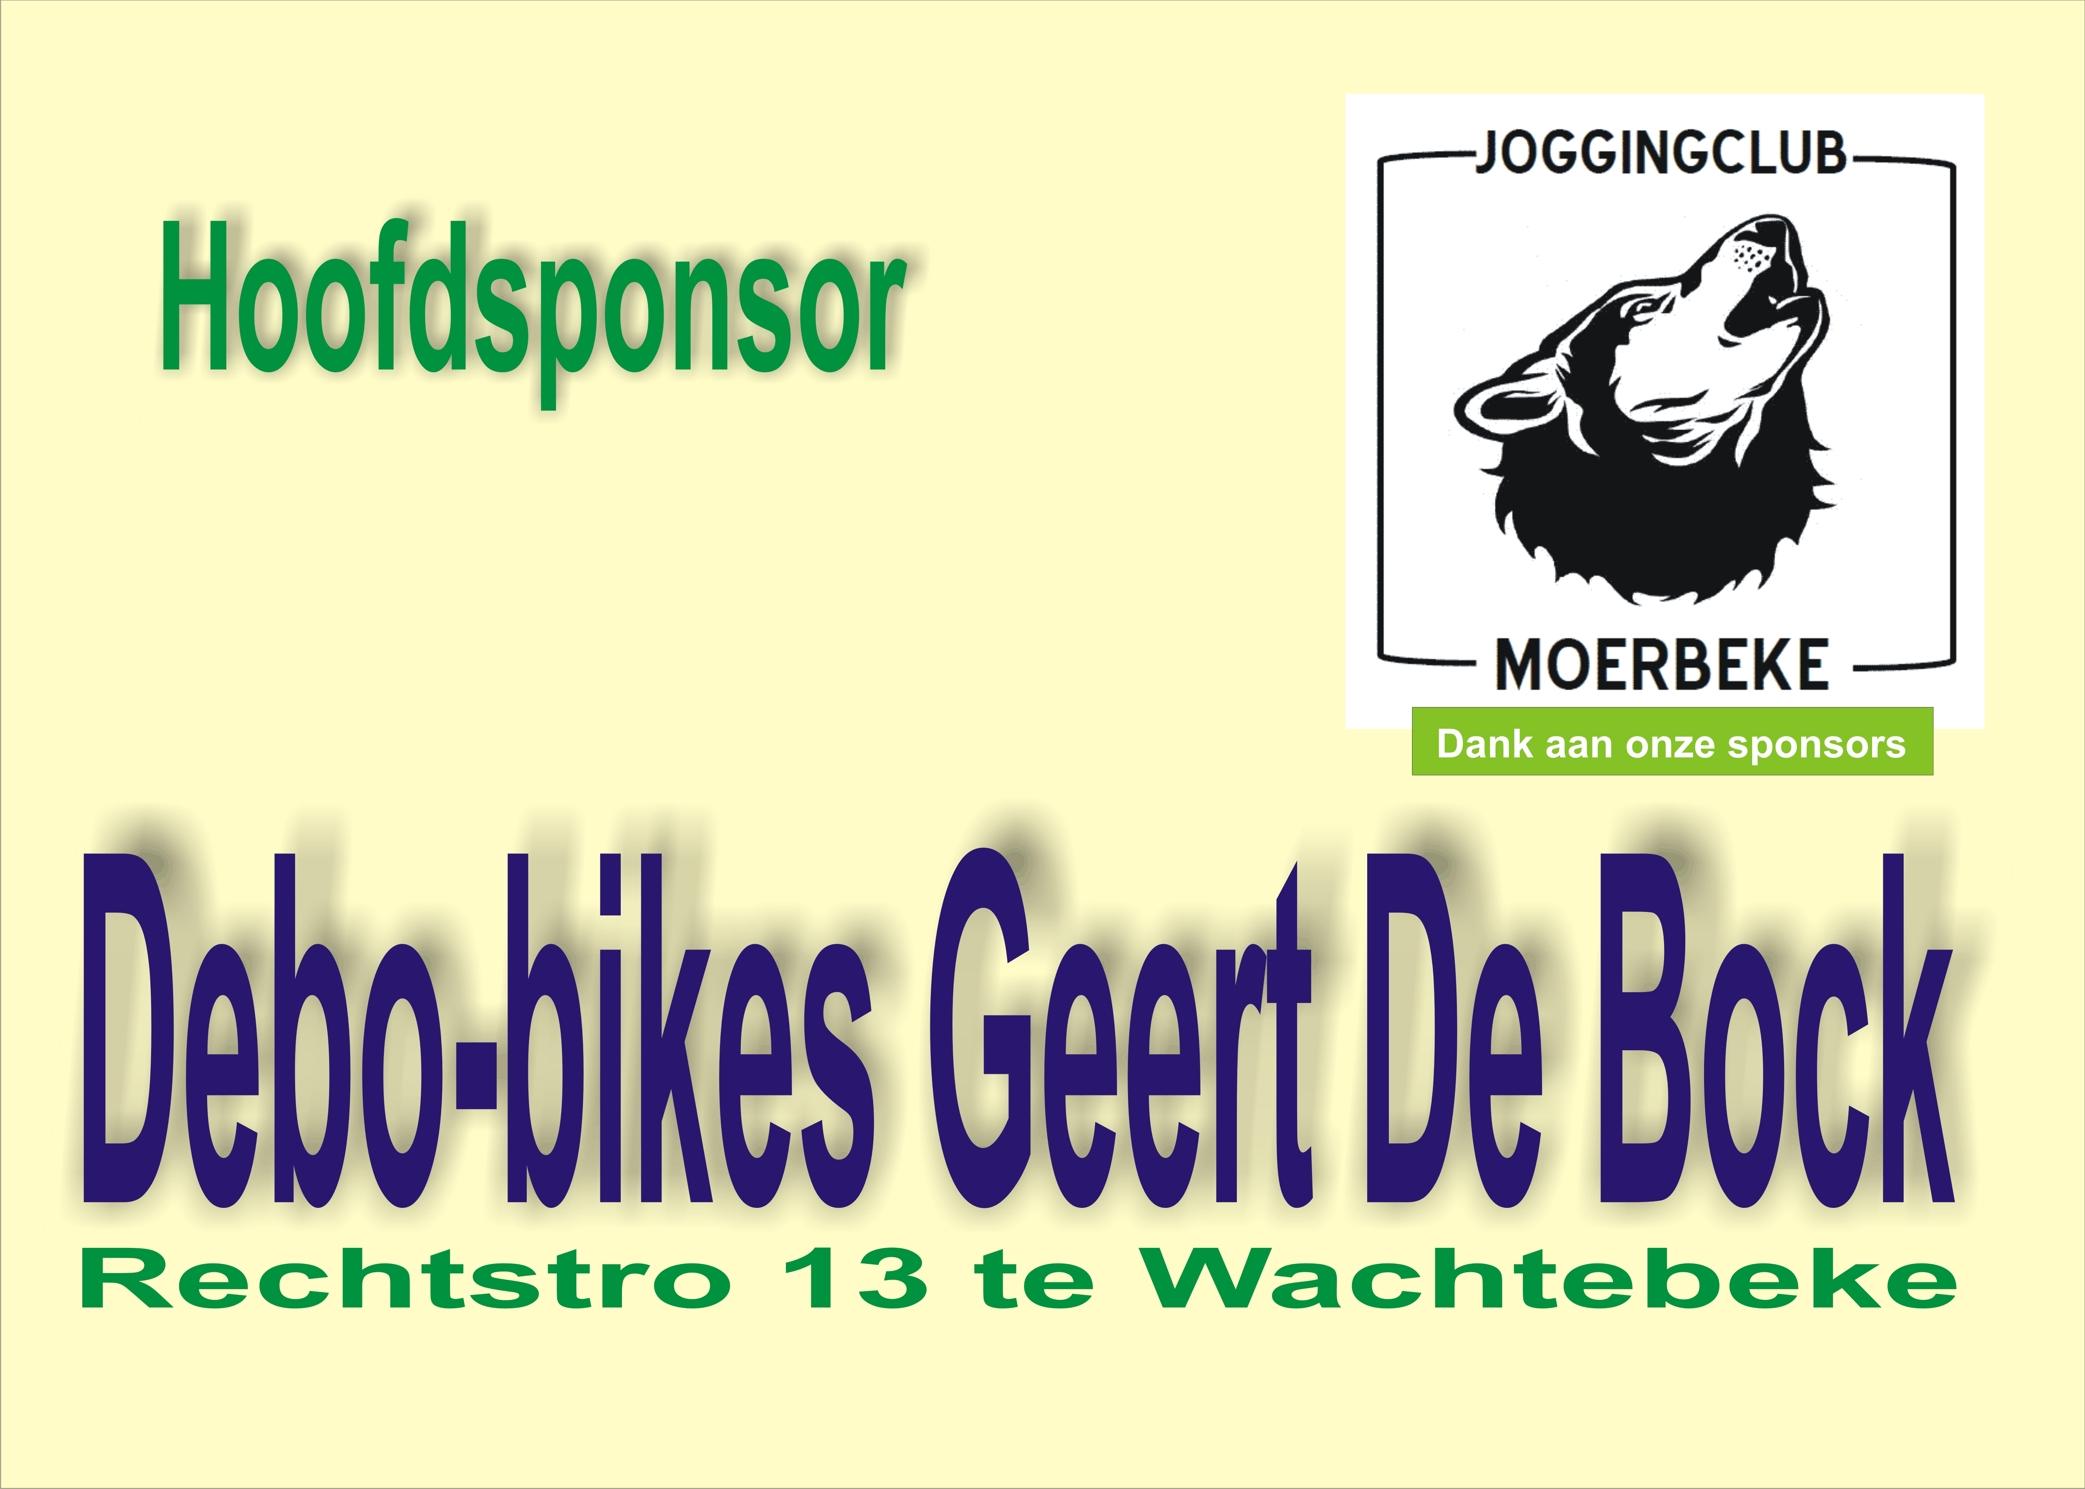 http://www.joggingclubmoerbeke.be/2014/mhl/mhlspons05.jpg